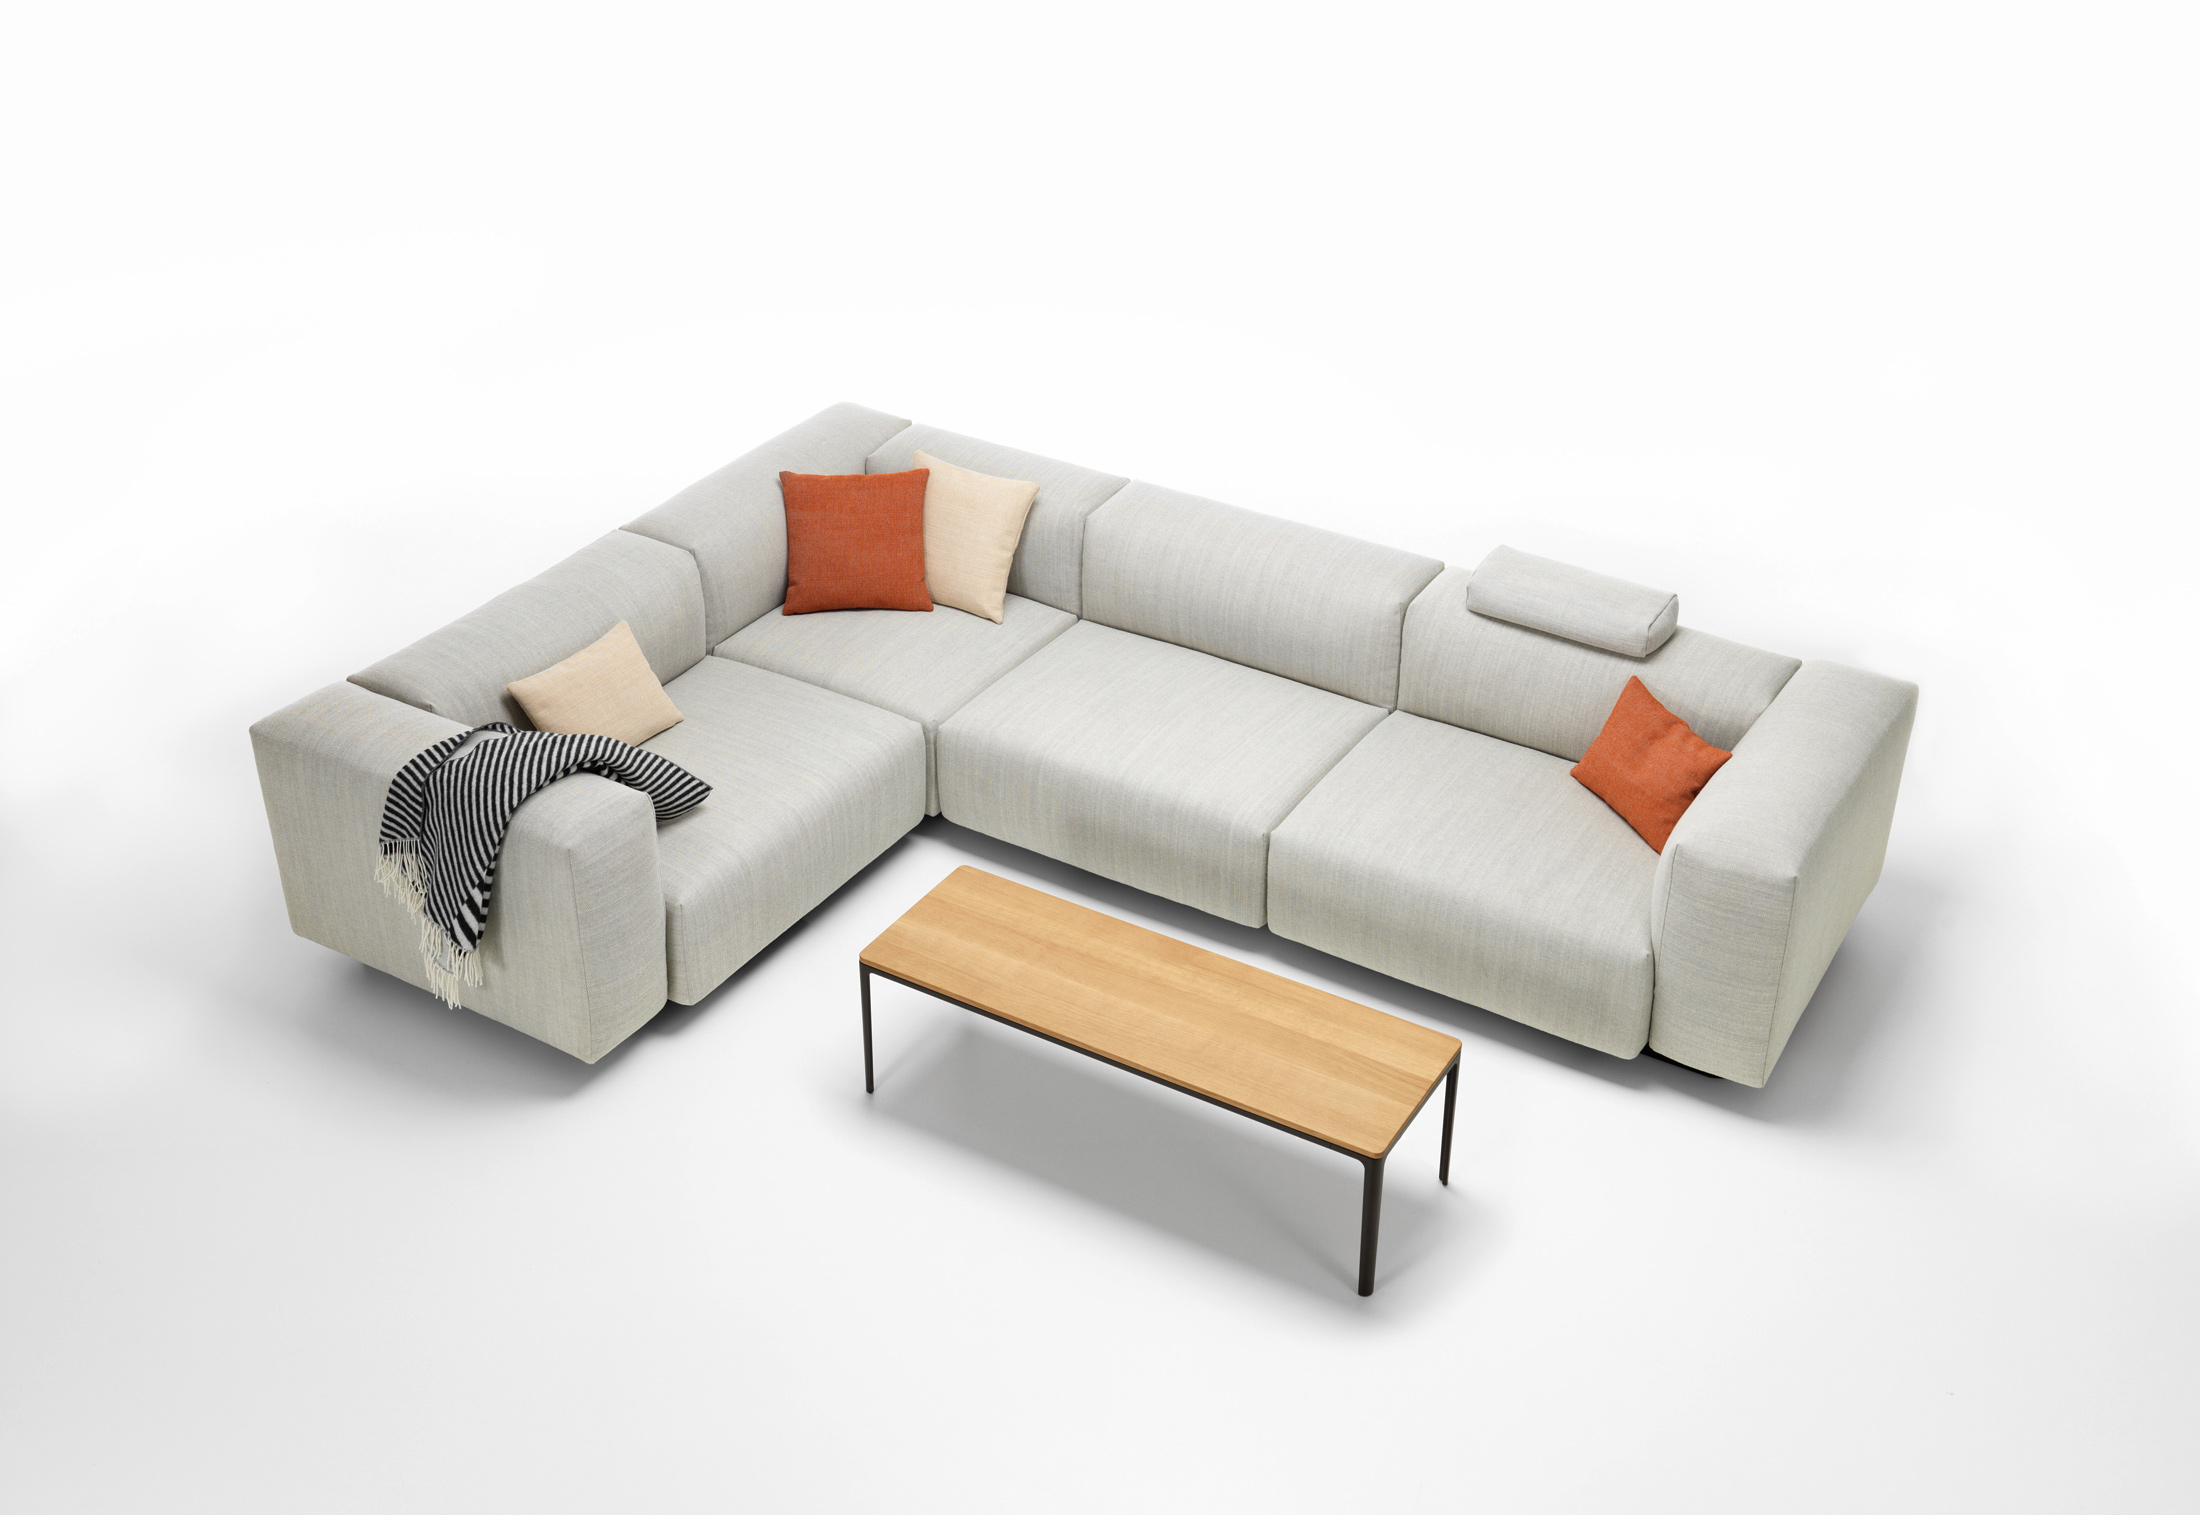 Soft modular sofa by vitra stylepark for Sofa modular exterior